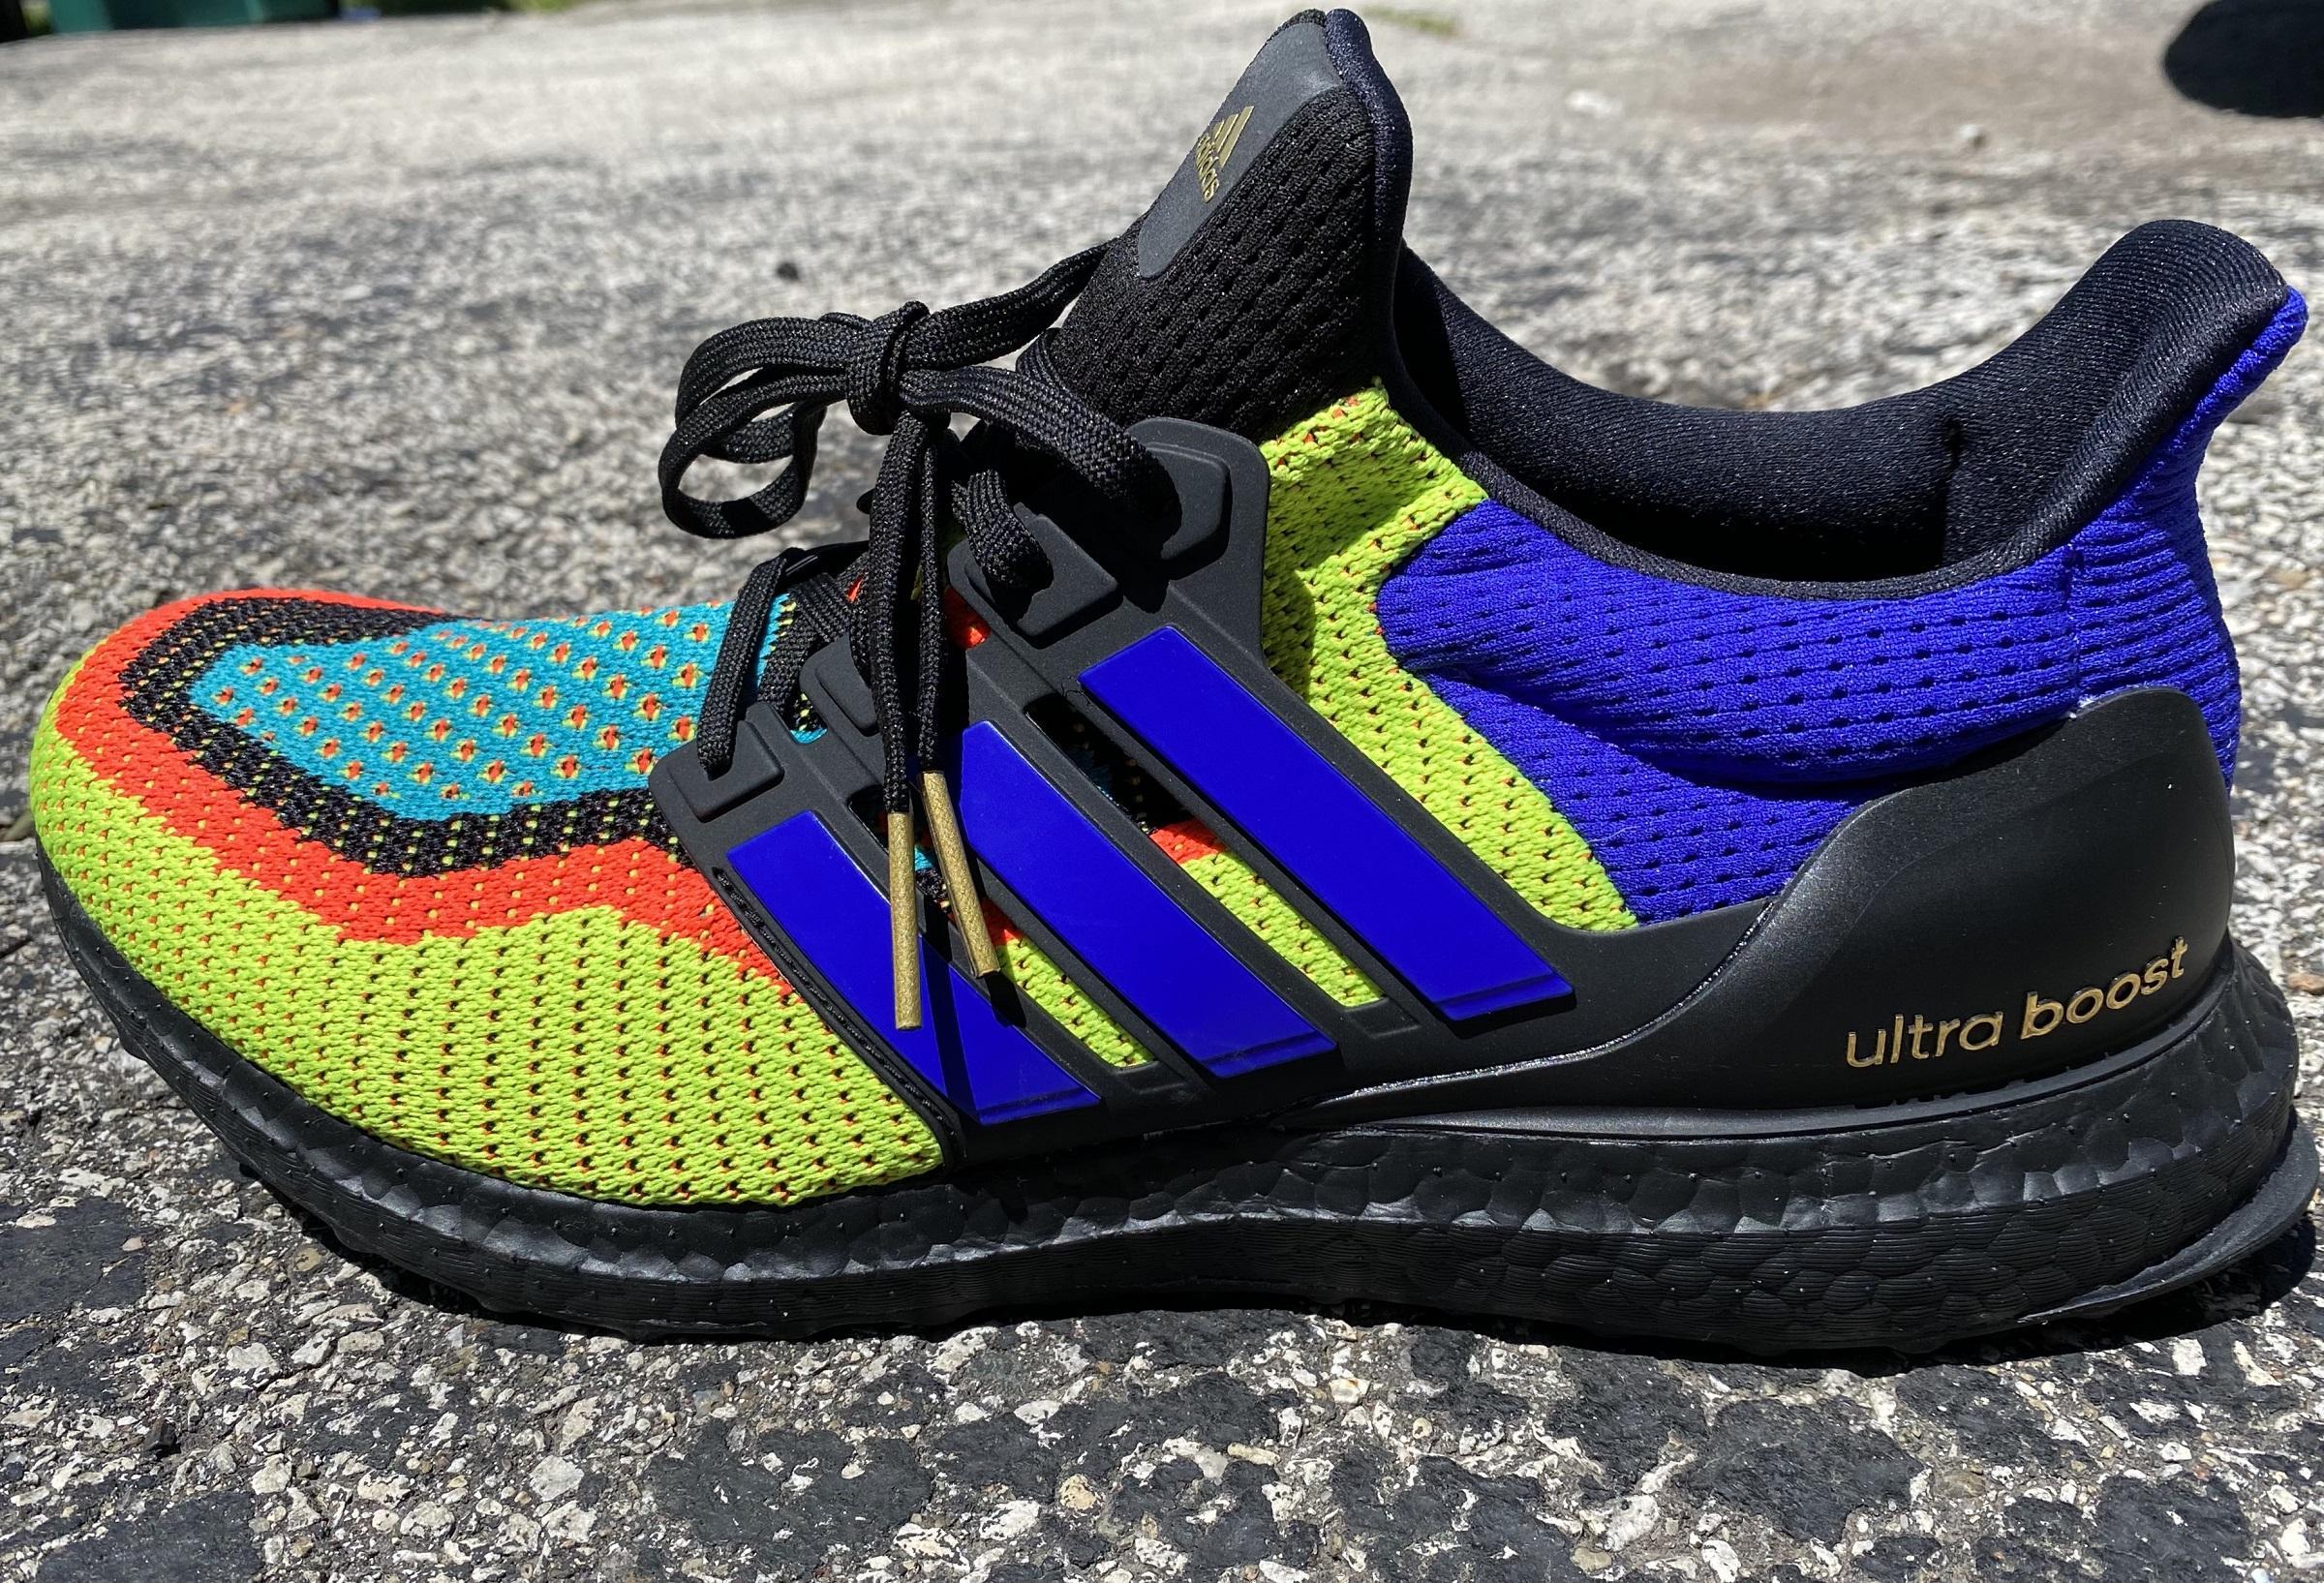 Adidas Ultraboost DNA